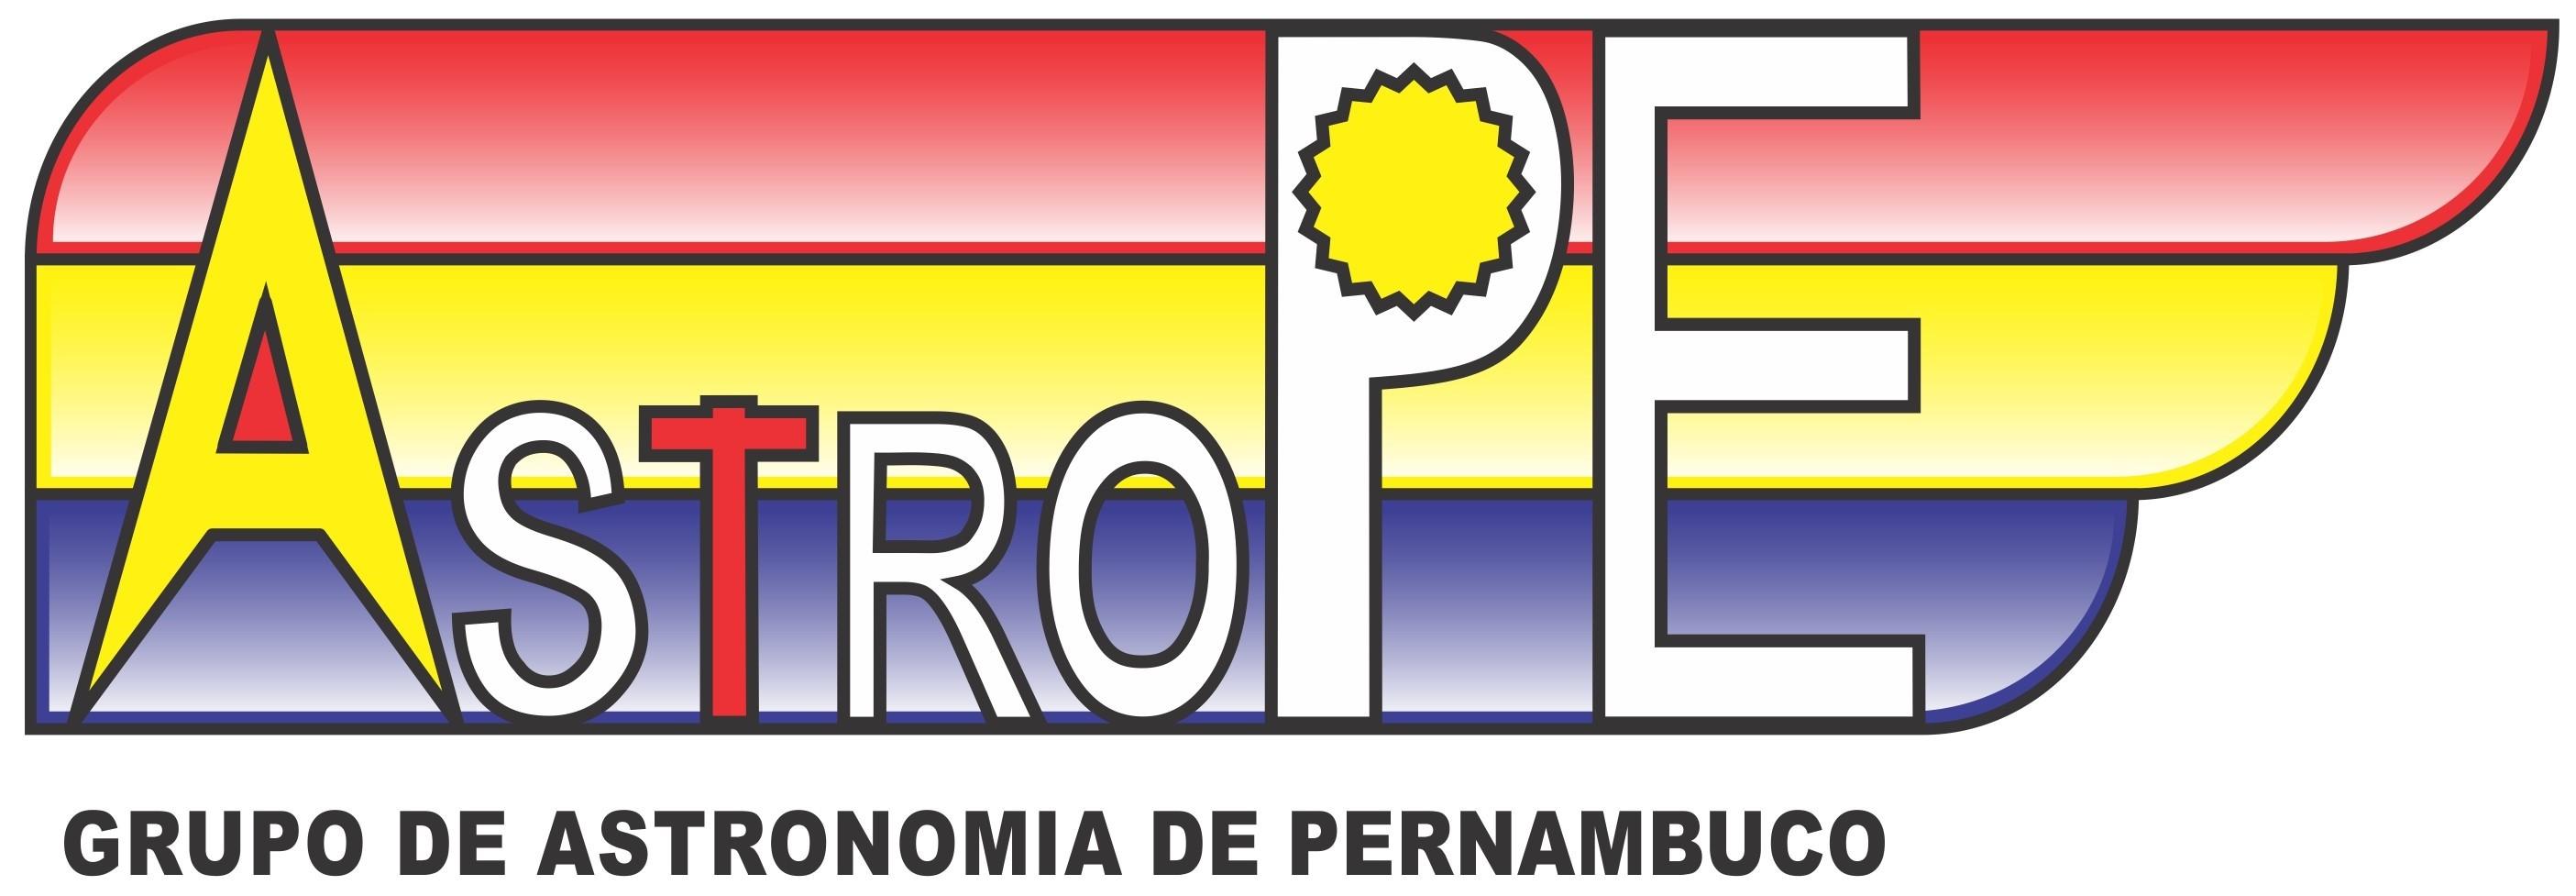 Logo RGB - AstroPE - 2016 - Grupo de Astronomia de Pernambuco